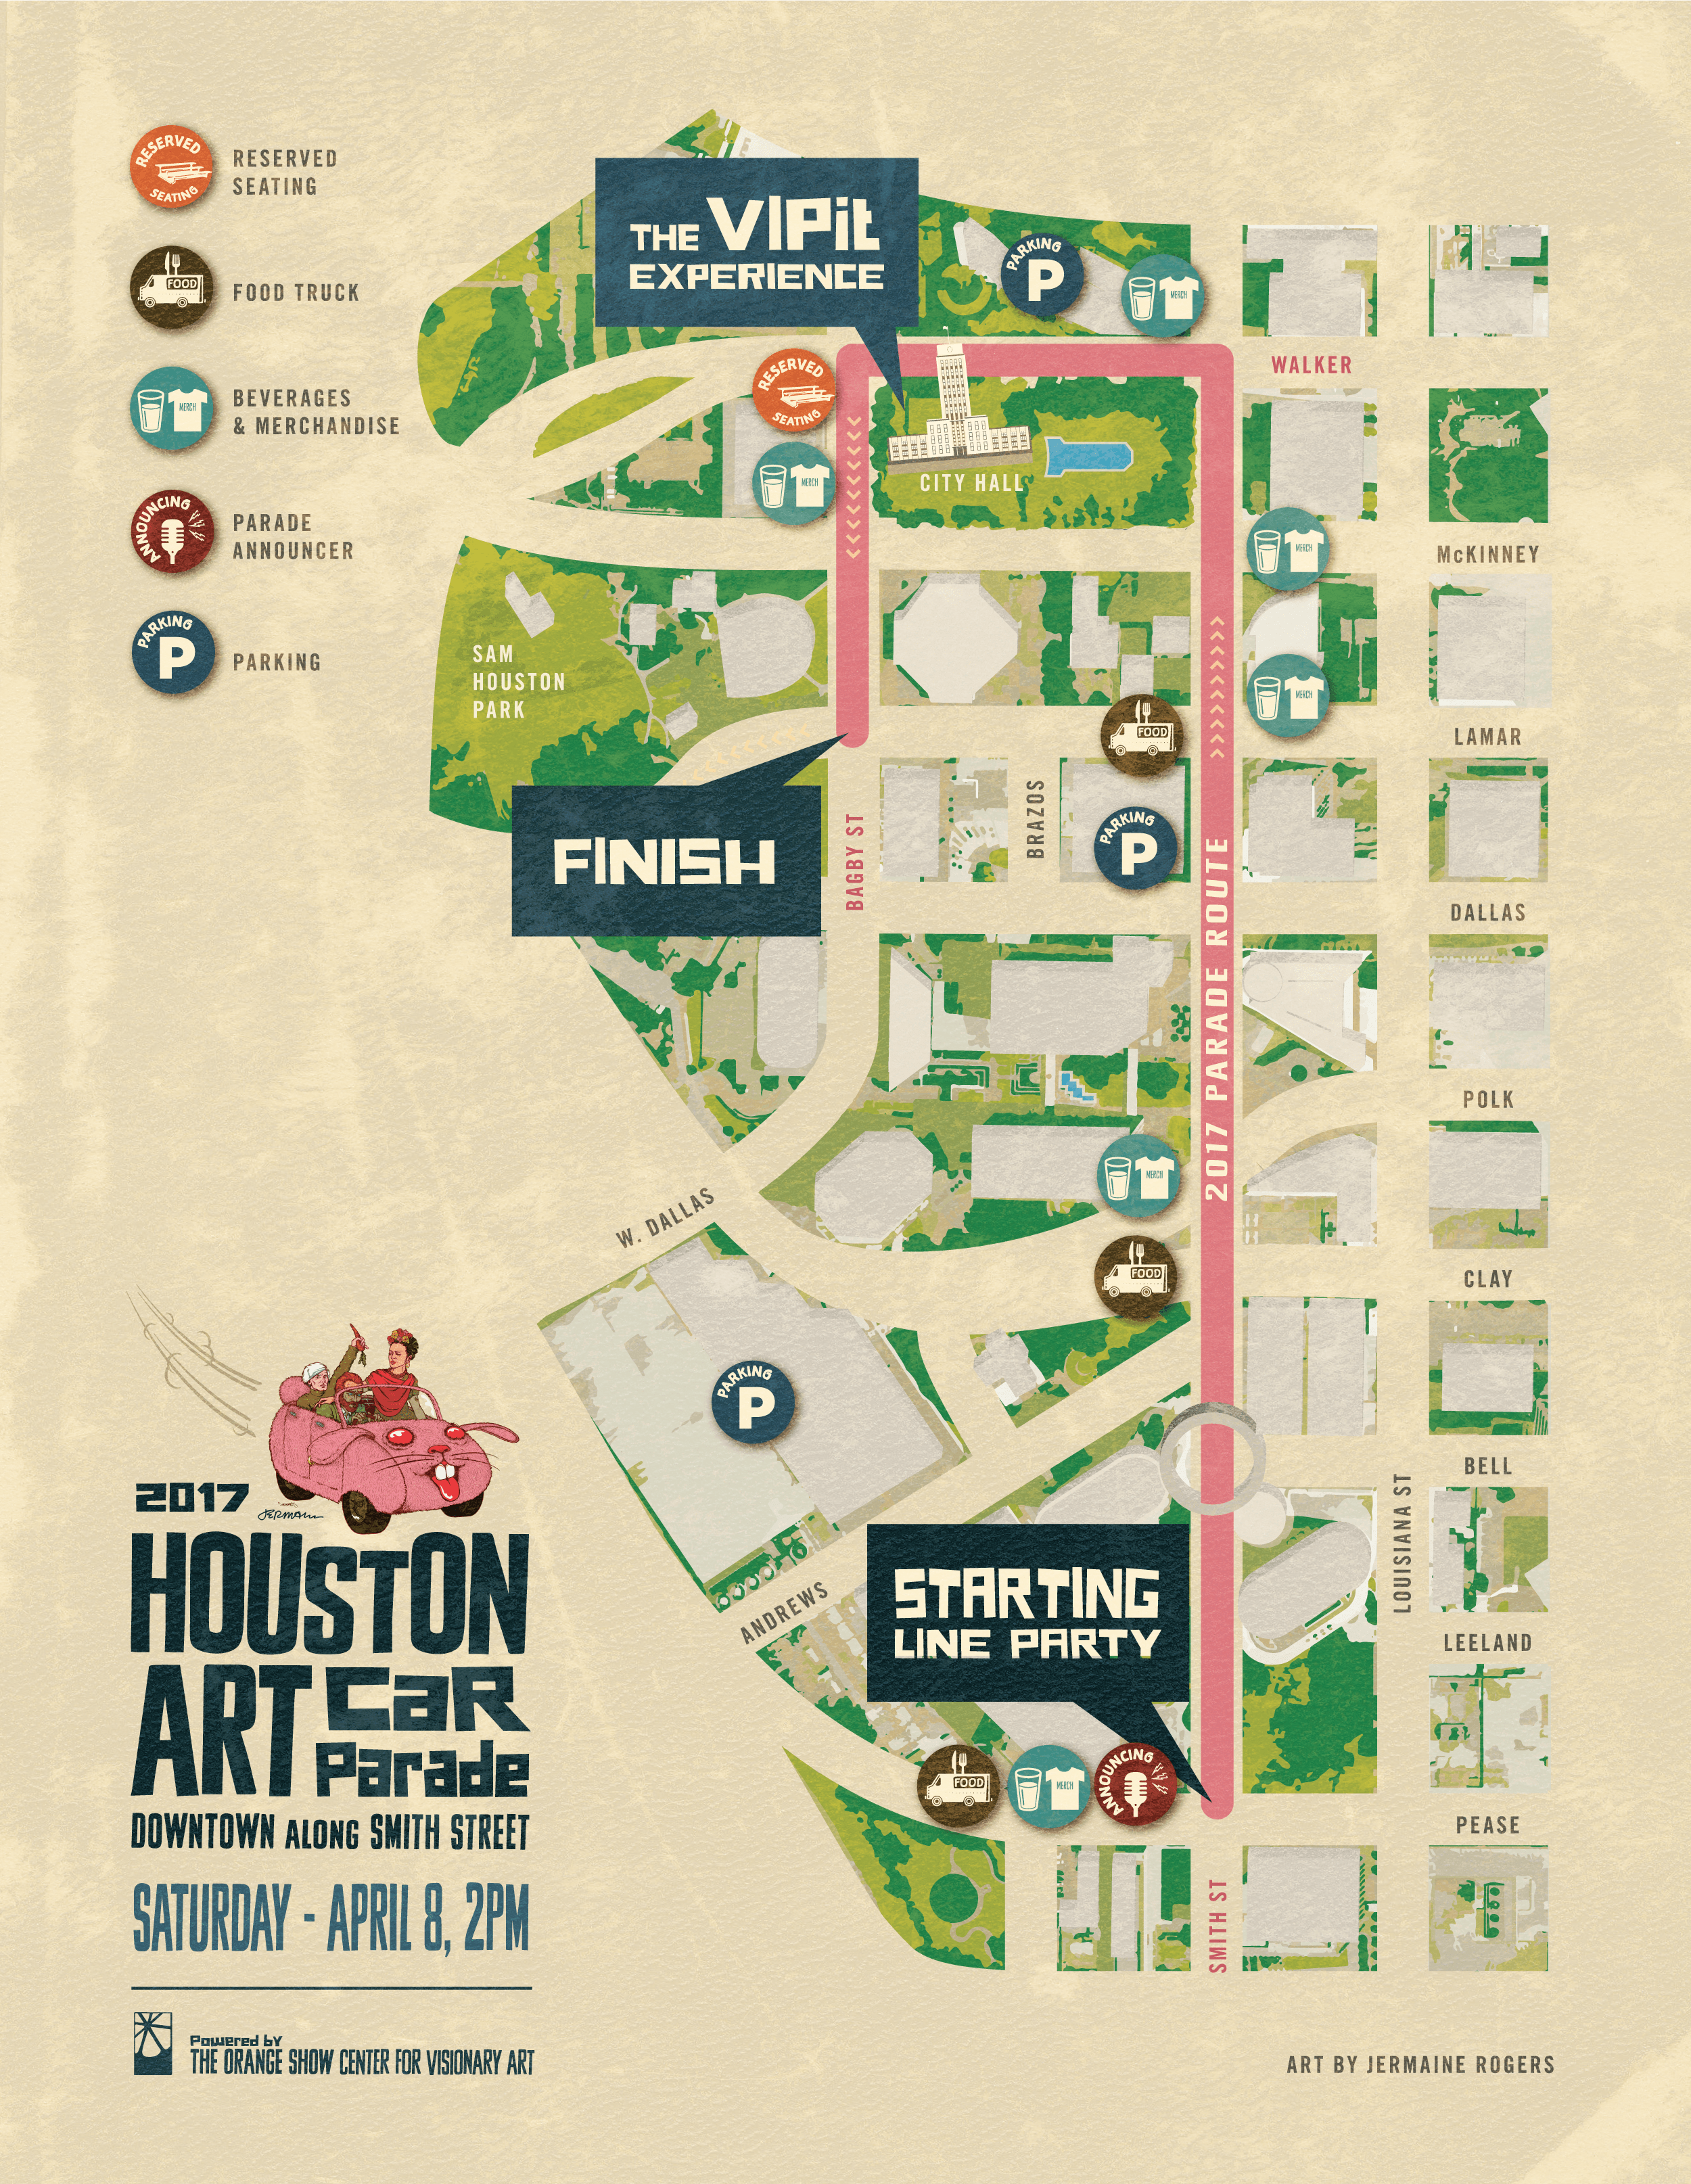 2017 Parade Map